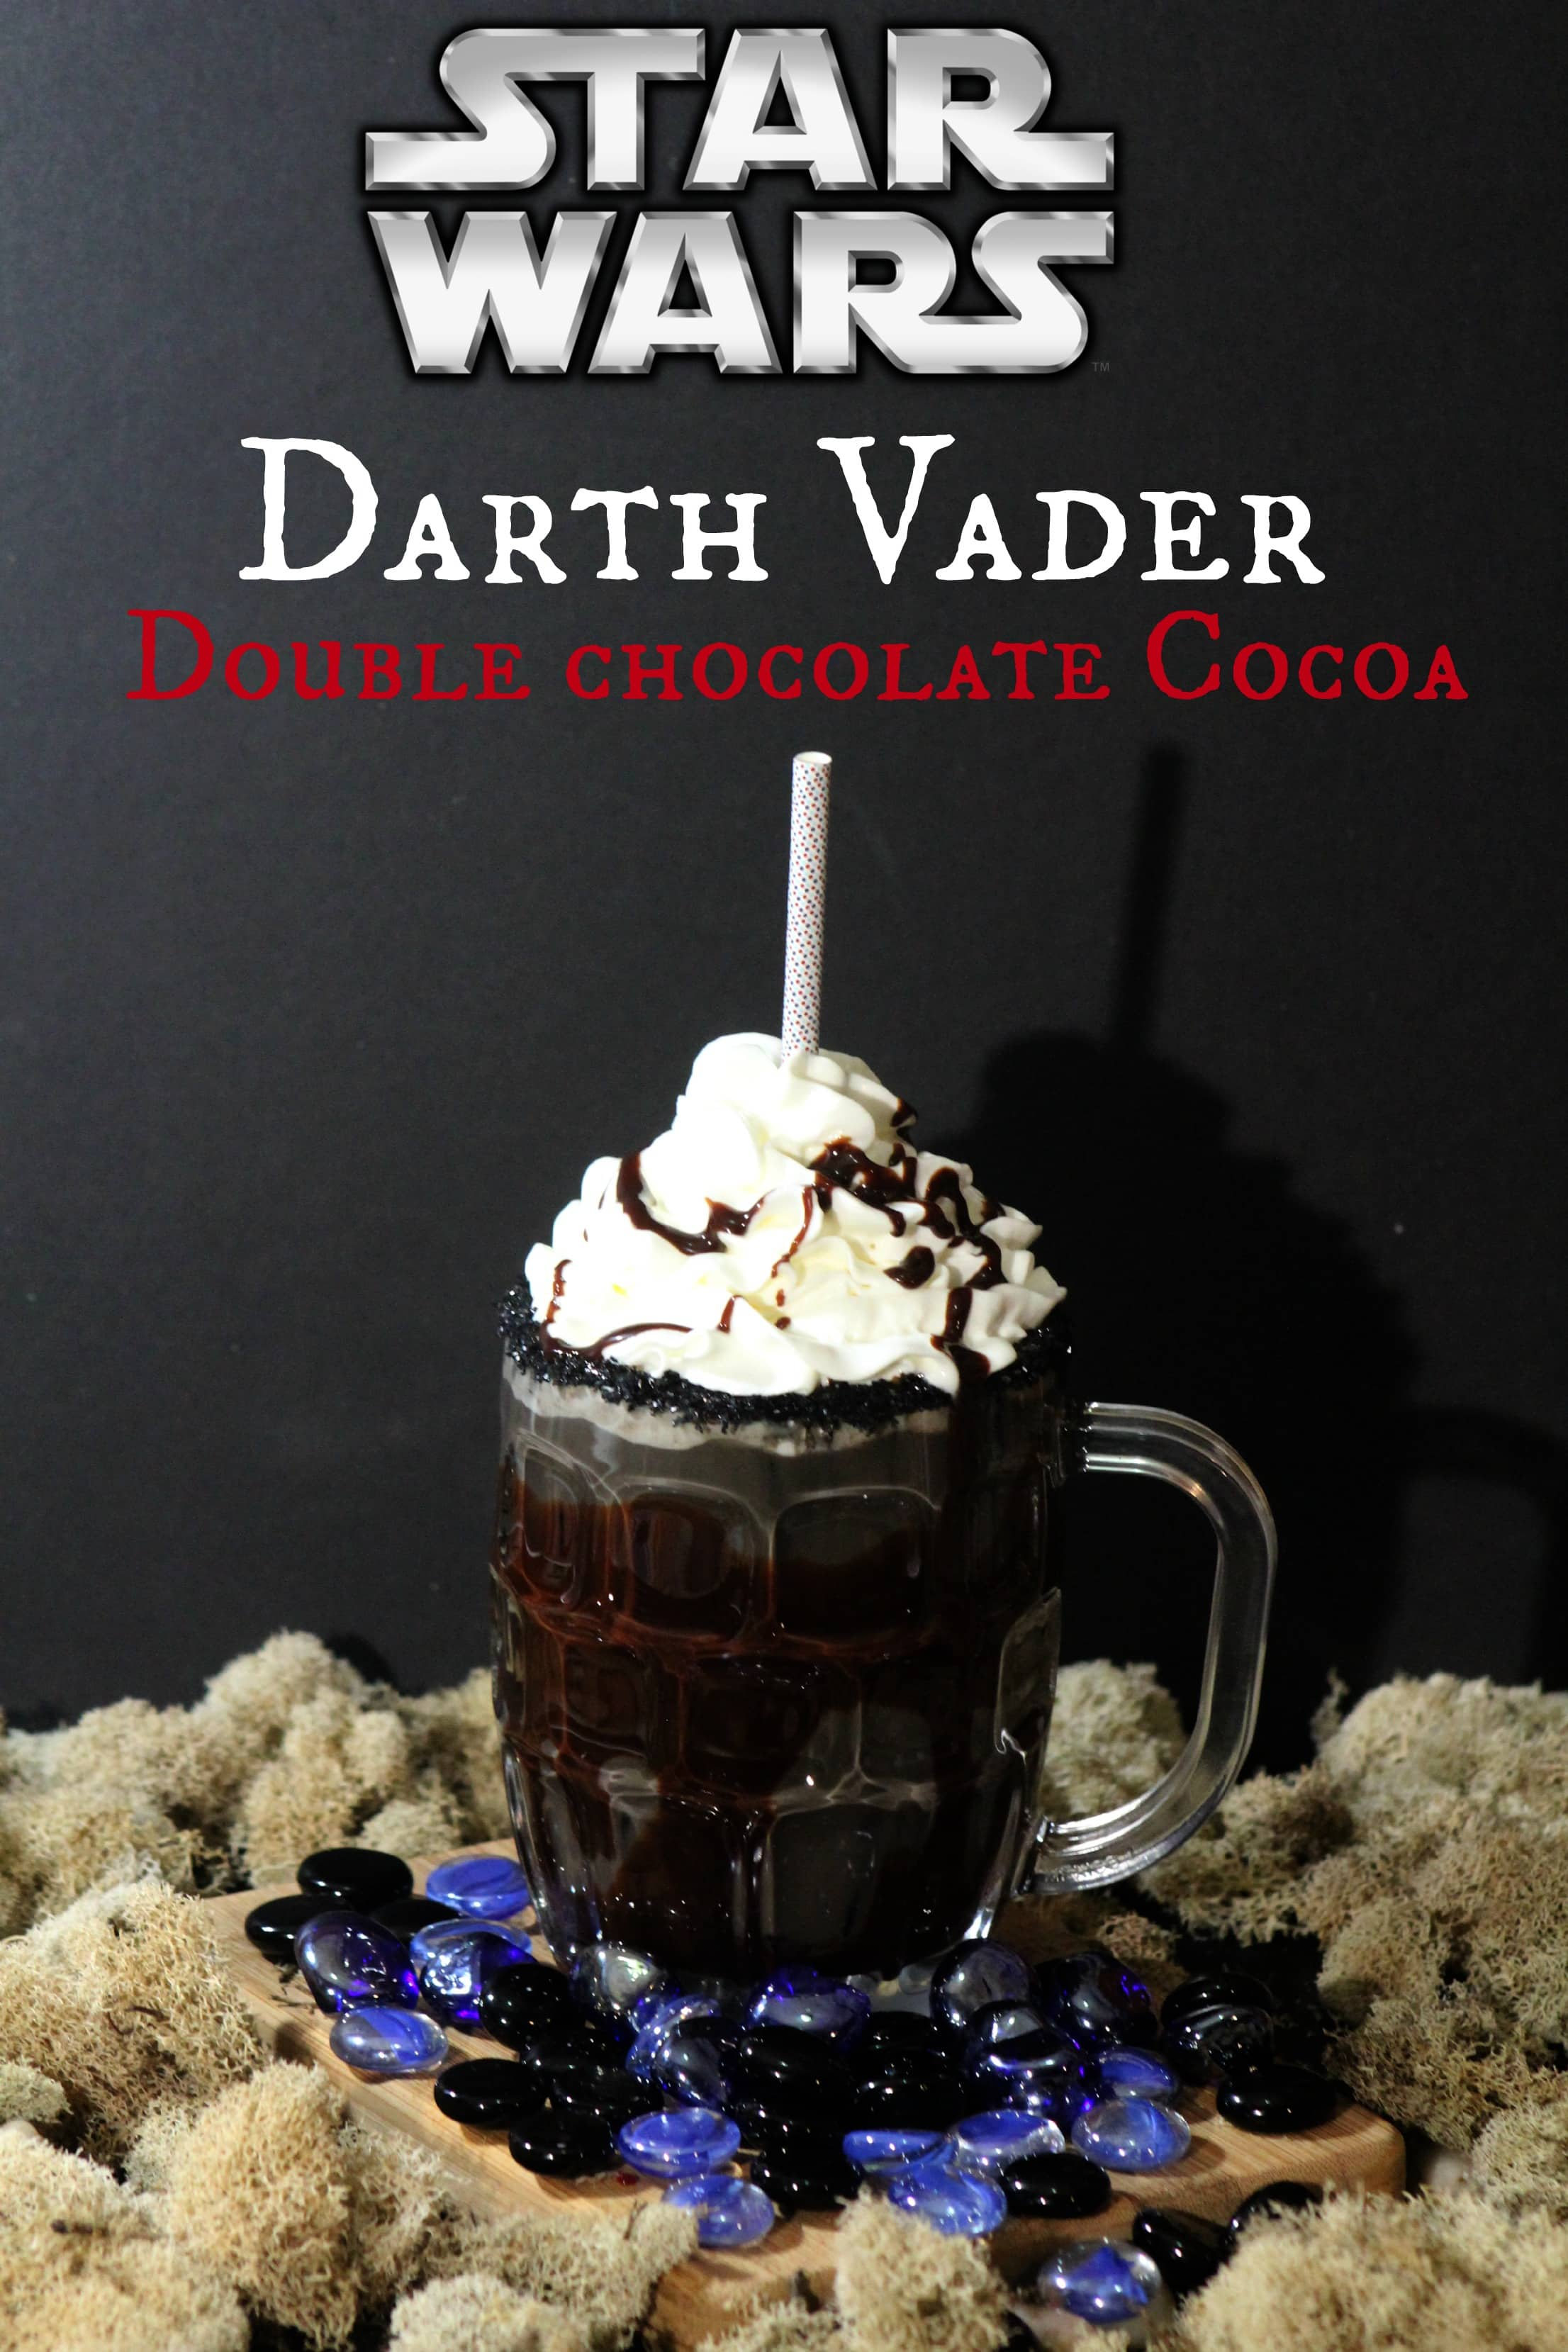 Star wars Darth Vader cocoa 1